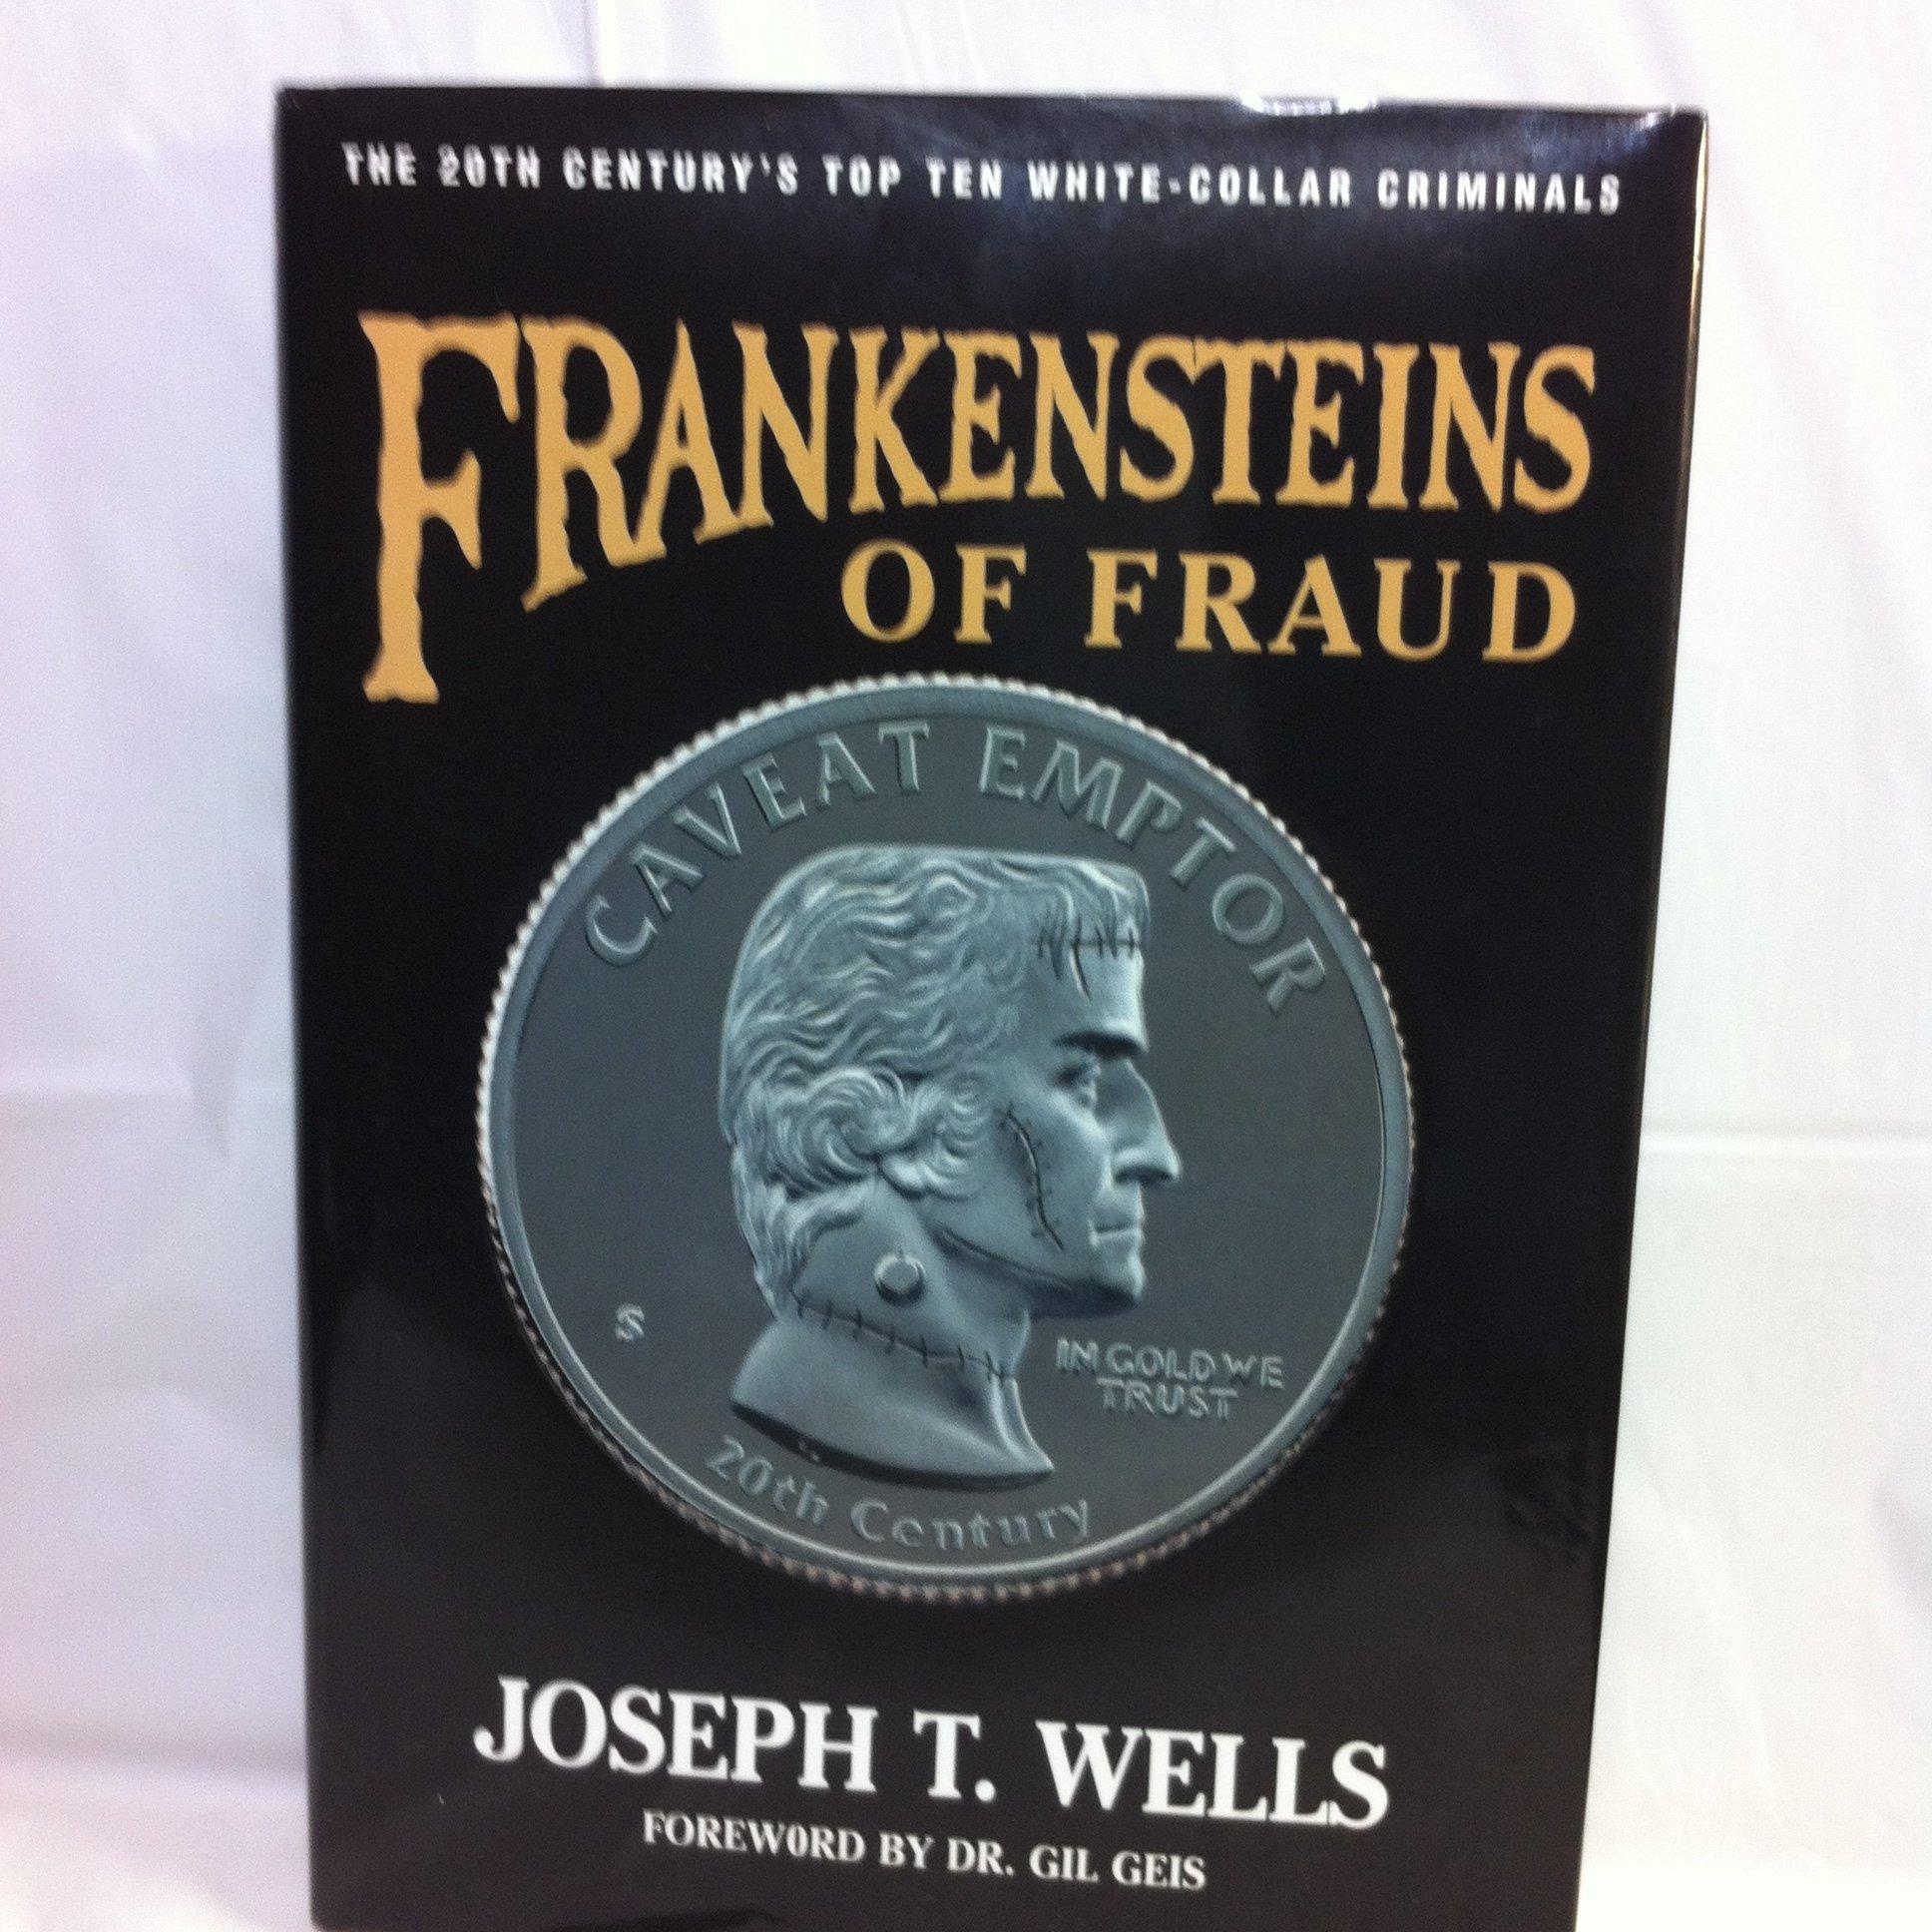 5 brilliant frauds of the XX century